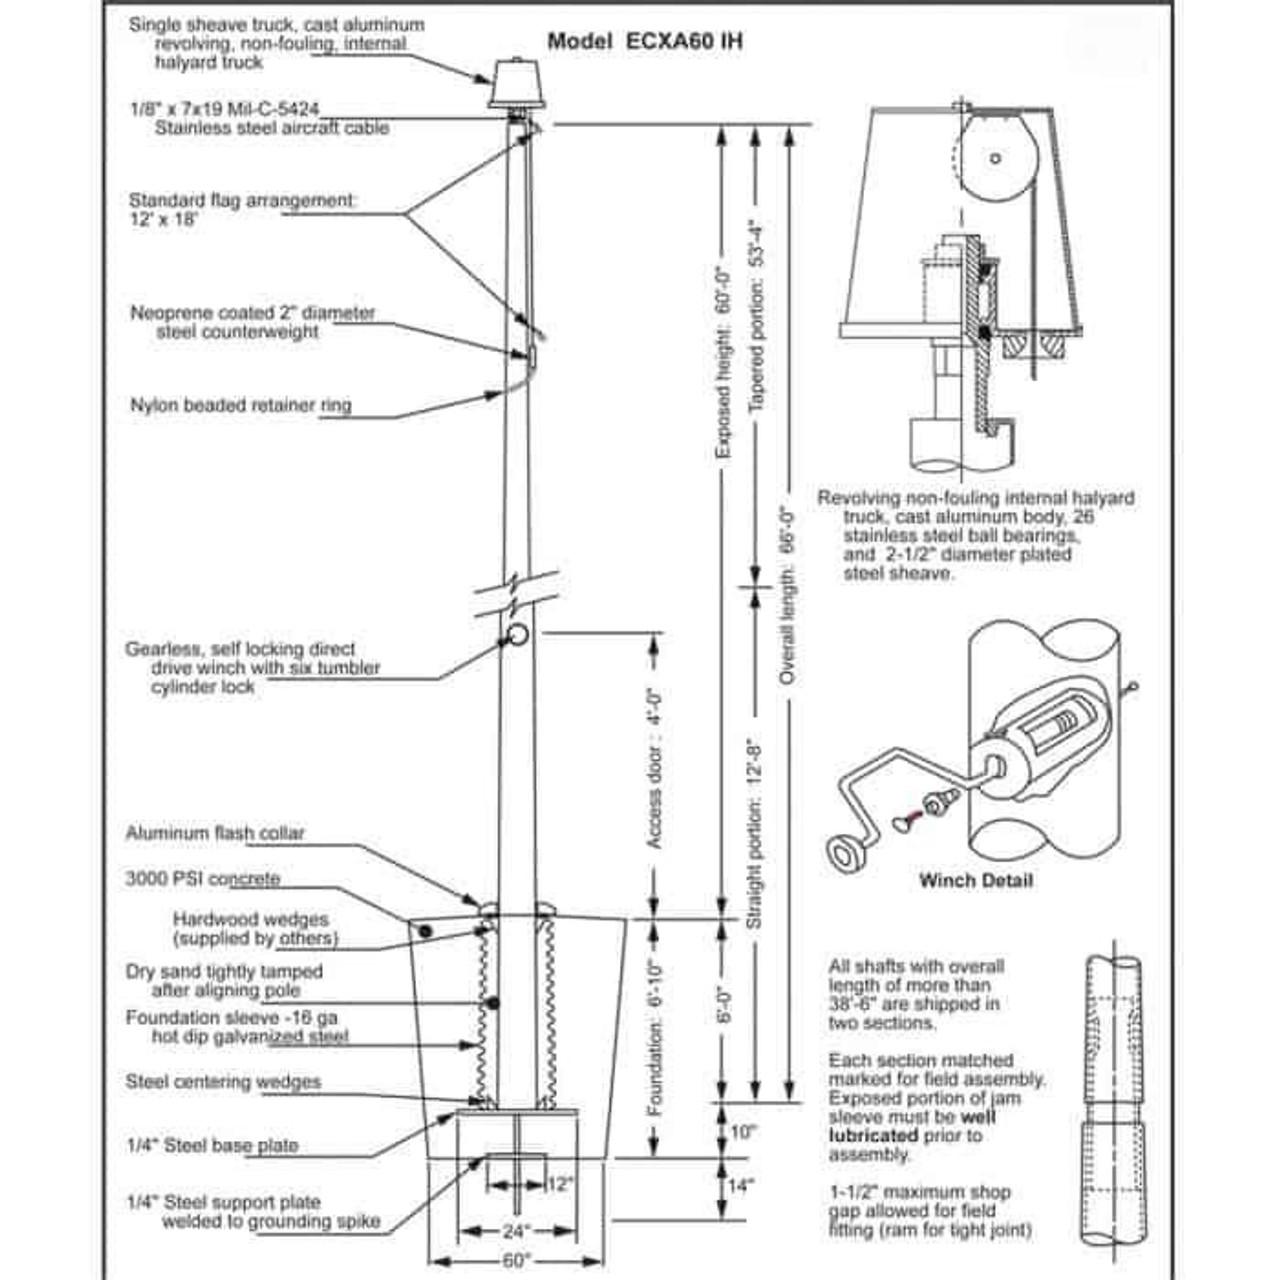 60 Internal Halyard Flagpole w/ Collar ECXA60IH